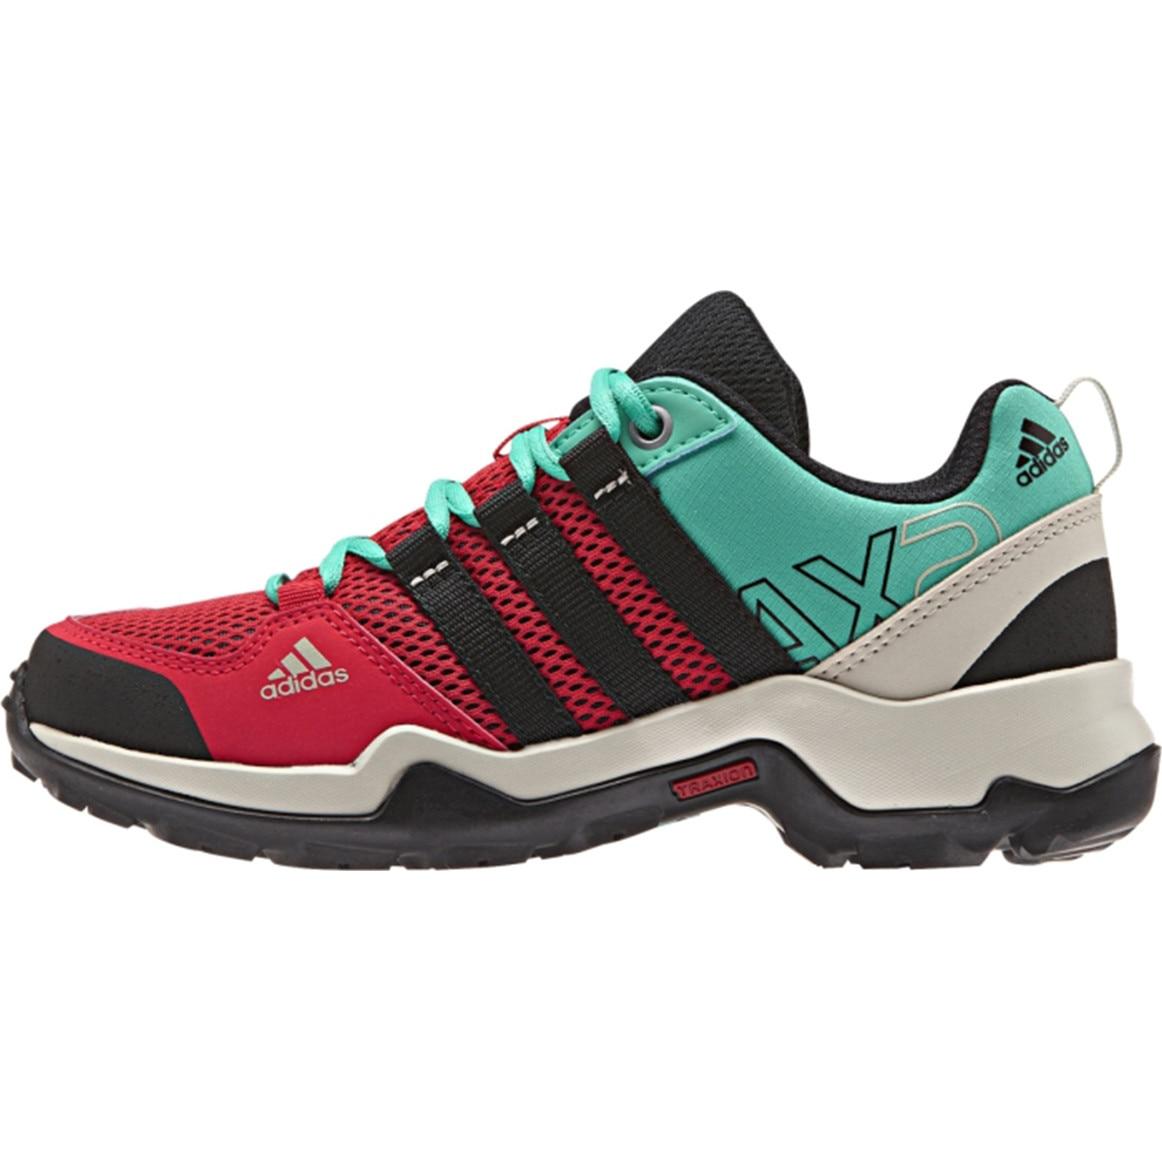 Borradura tambor instante  Pantofi sport Adidas AX2K ,unisex,multicolor,marime 39 1/3 EU - eMAG.ro